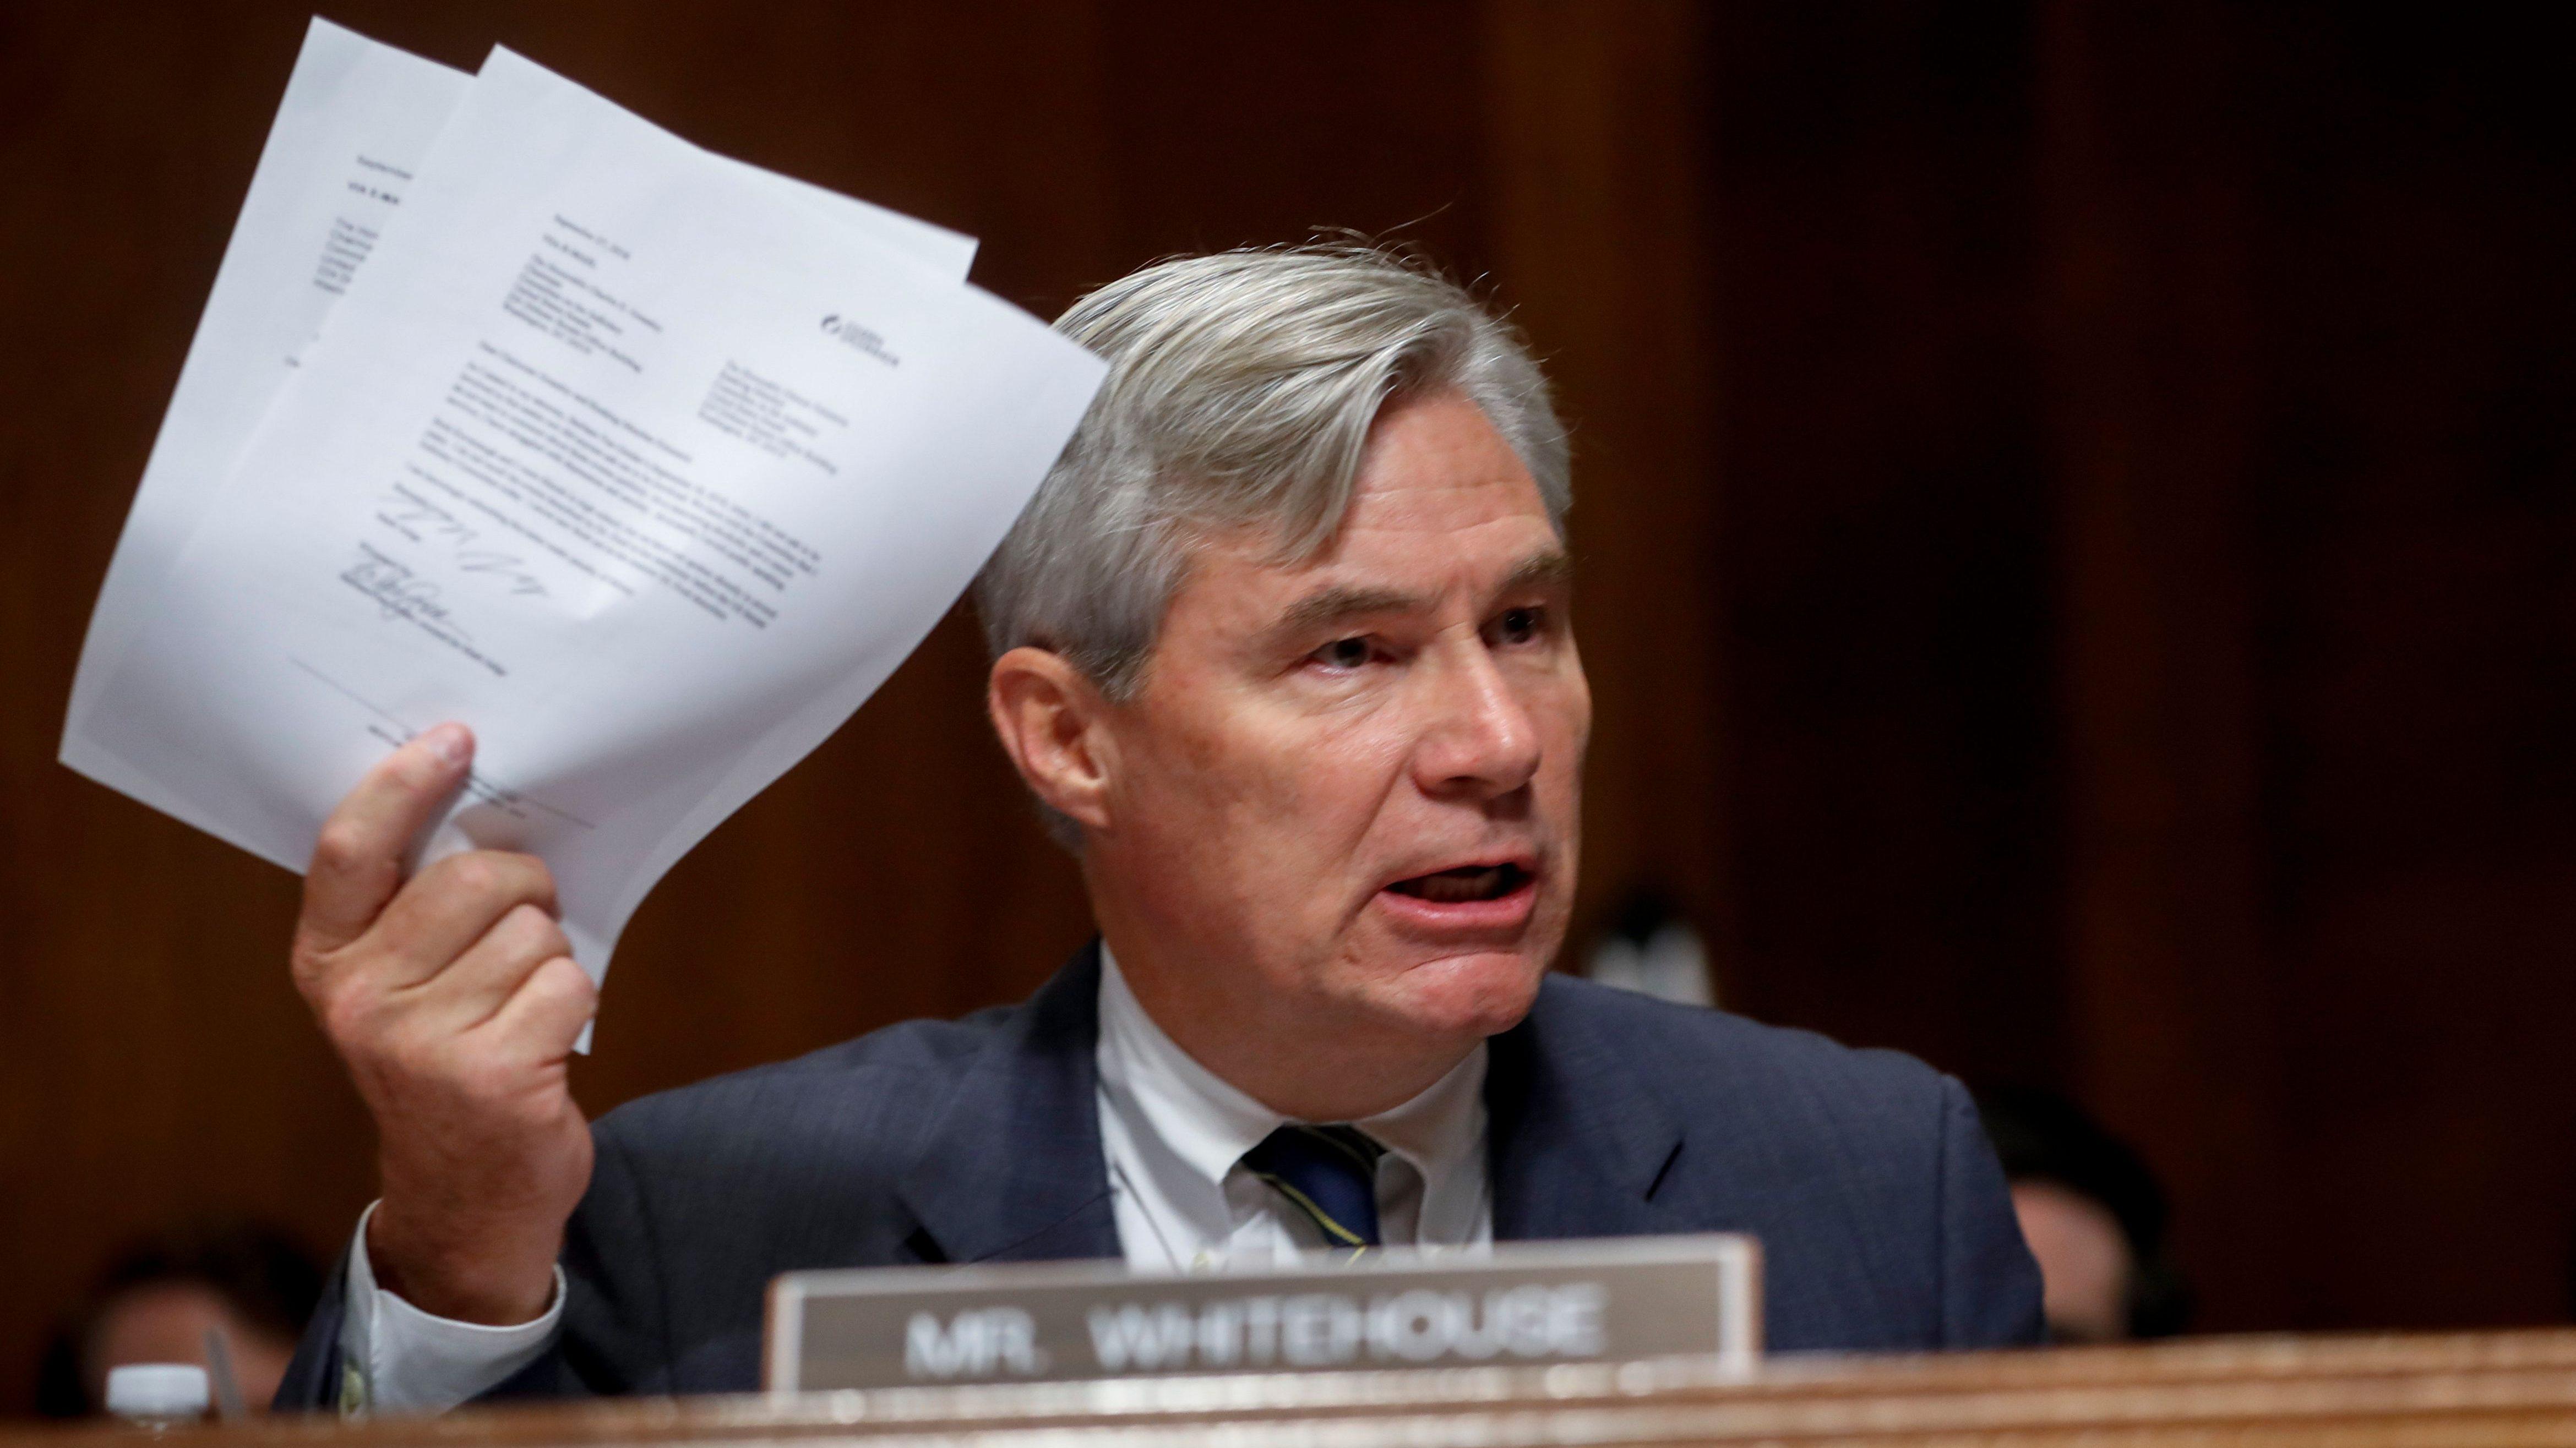 Sheldon Whitehouse brandishes documents during a Senate Judiciary Committee hearing for Brett Kavanaugh's supreme court nomination.